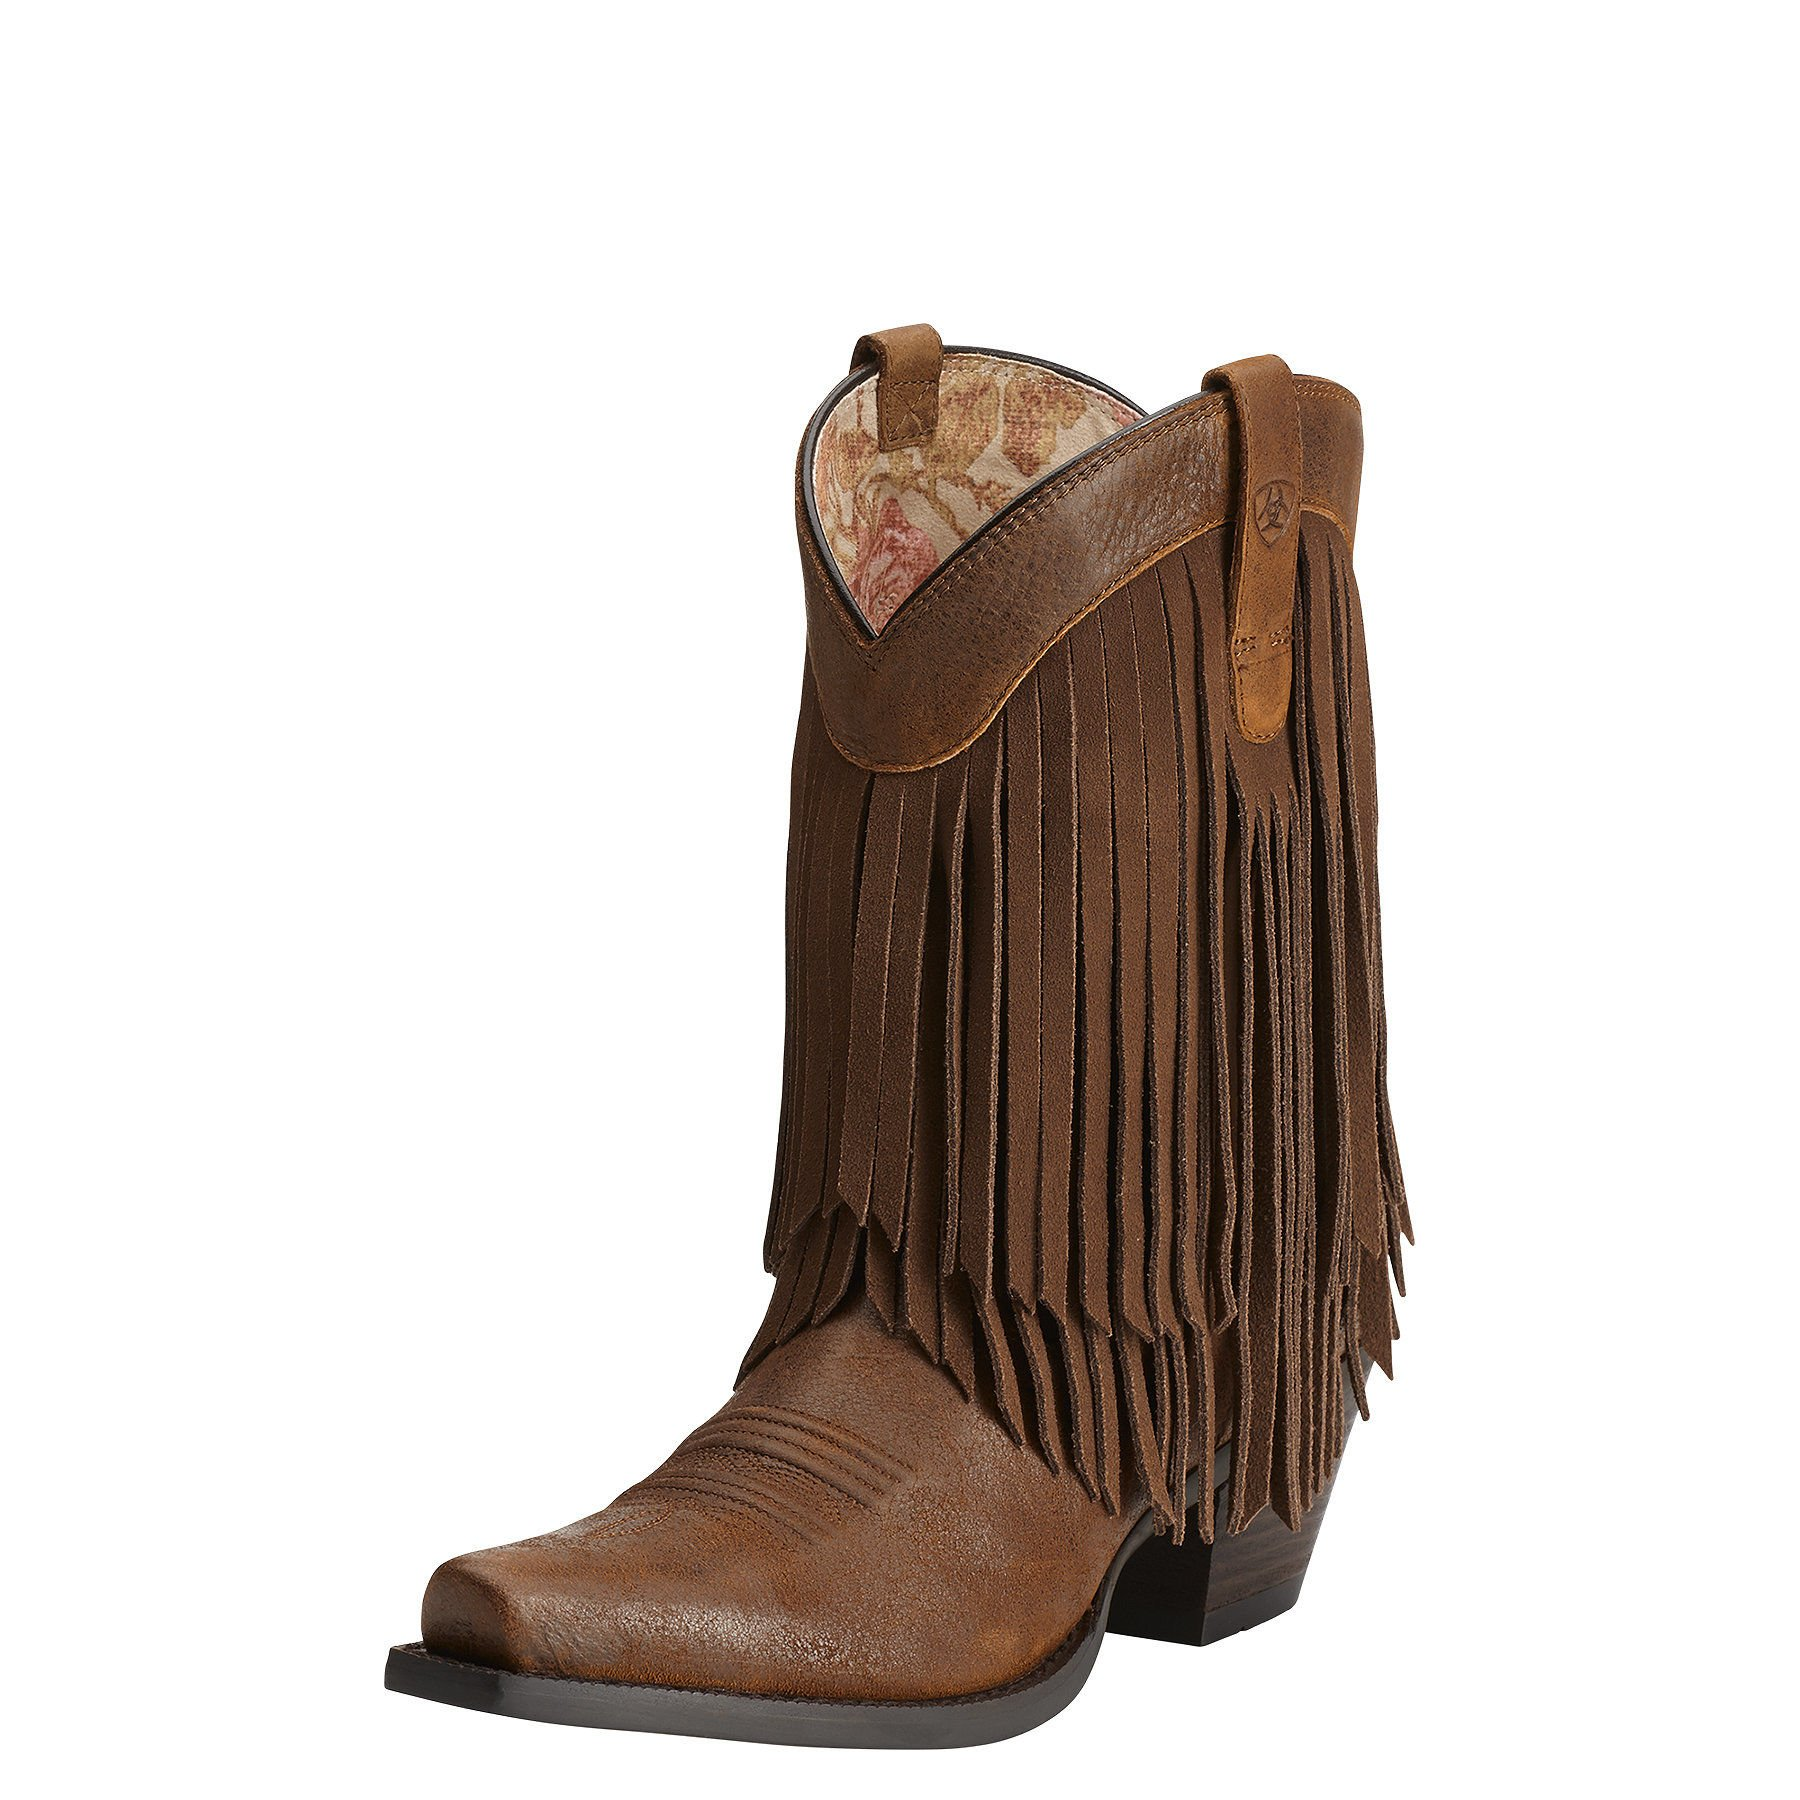 Ariat Women's Gold Rush Western Cowboy Boot, Terra Brown, 10 M US